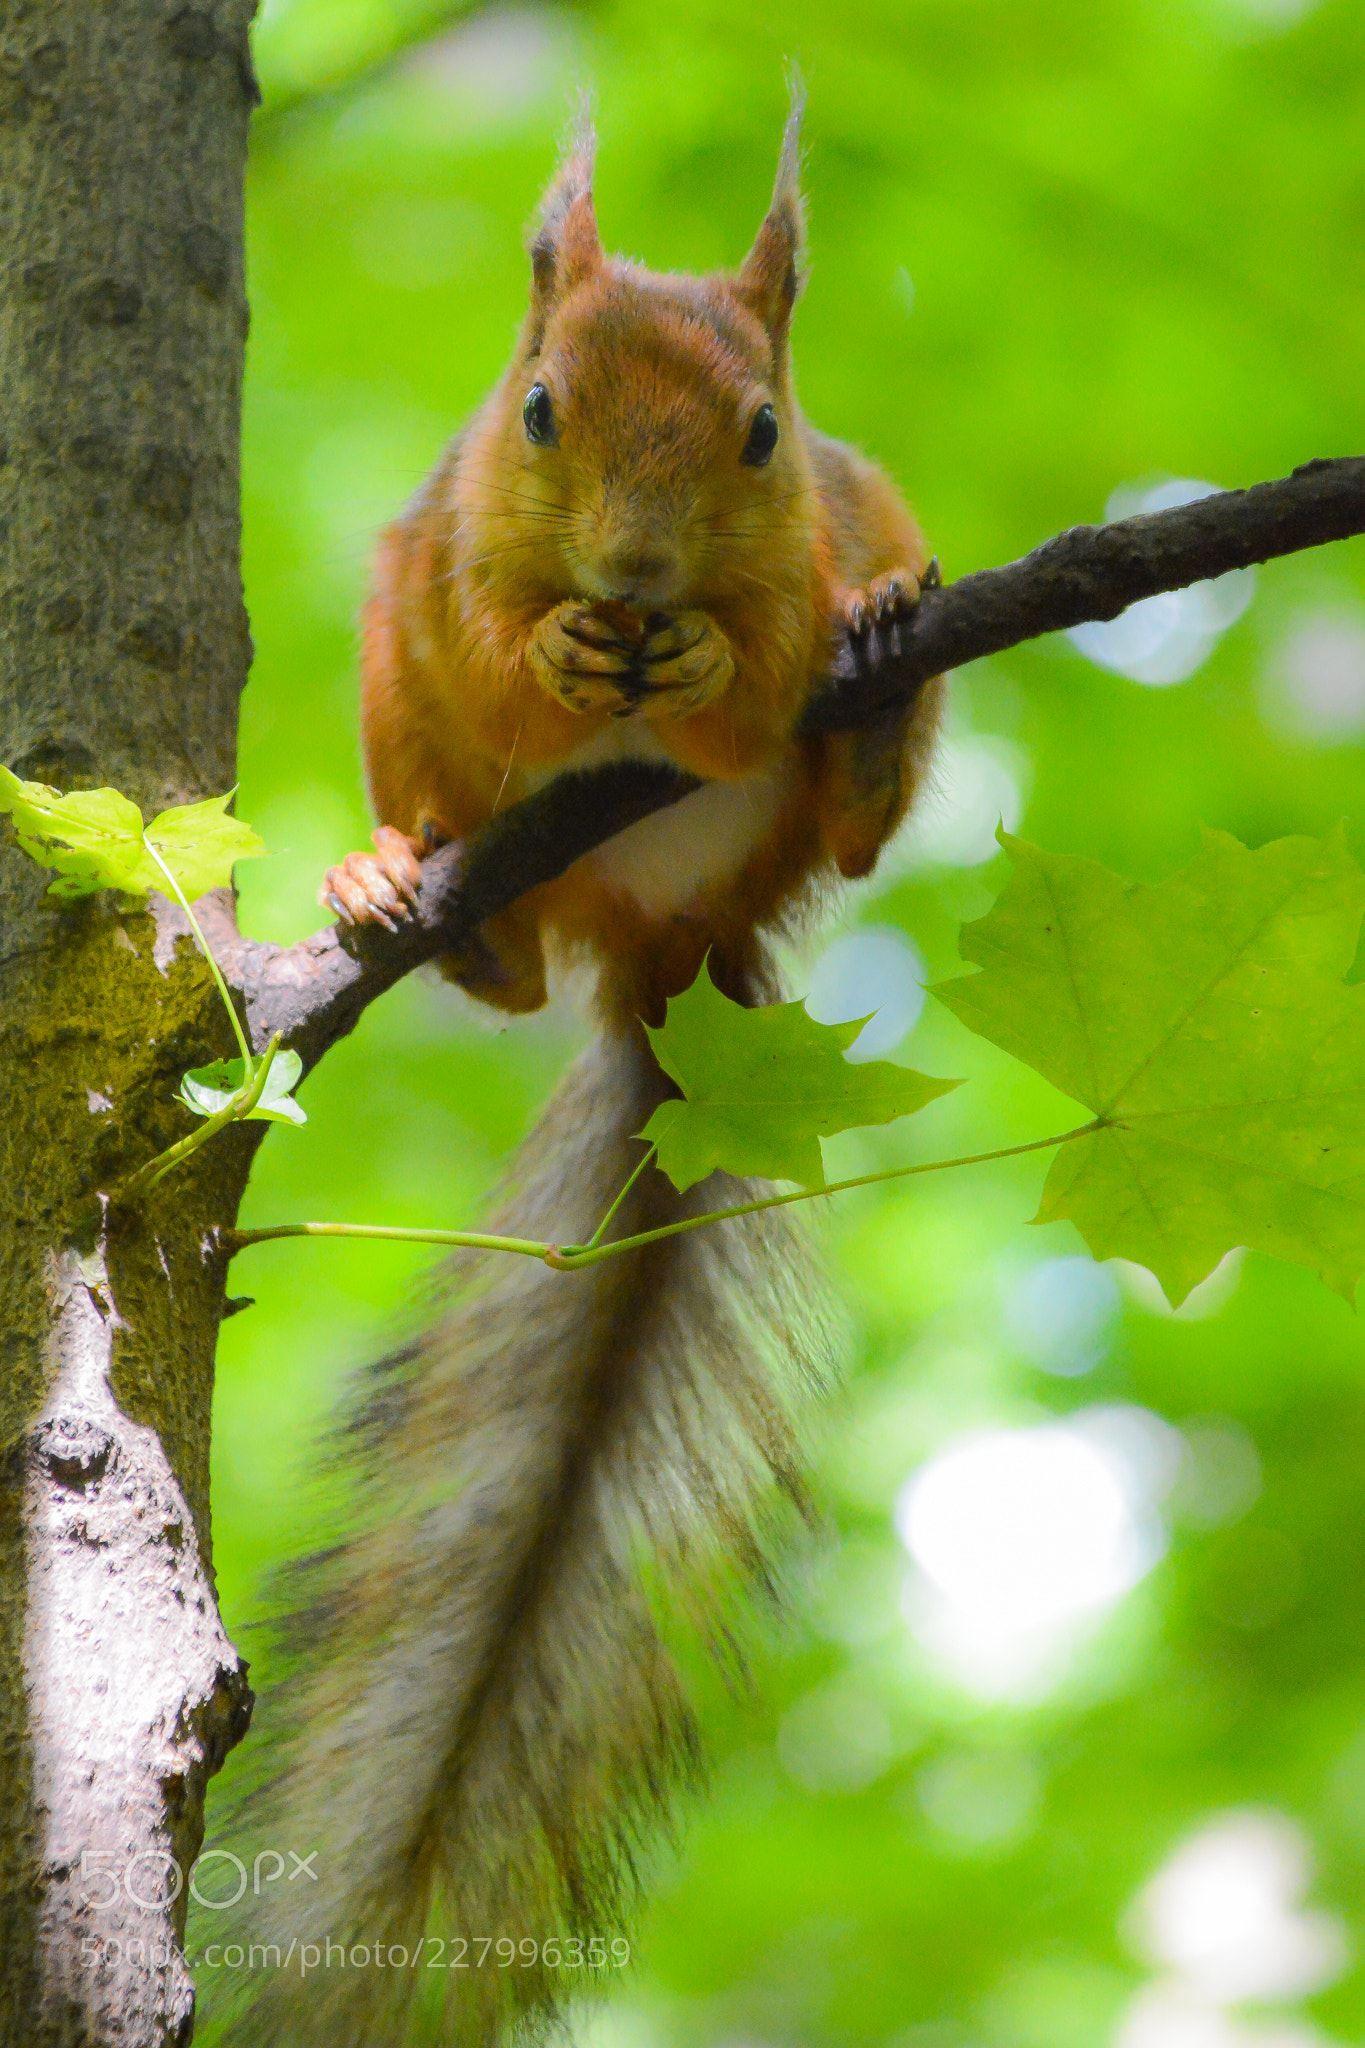 squirrel ivan anisimov moscow russia nikon d7100 animals